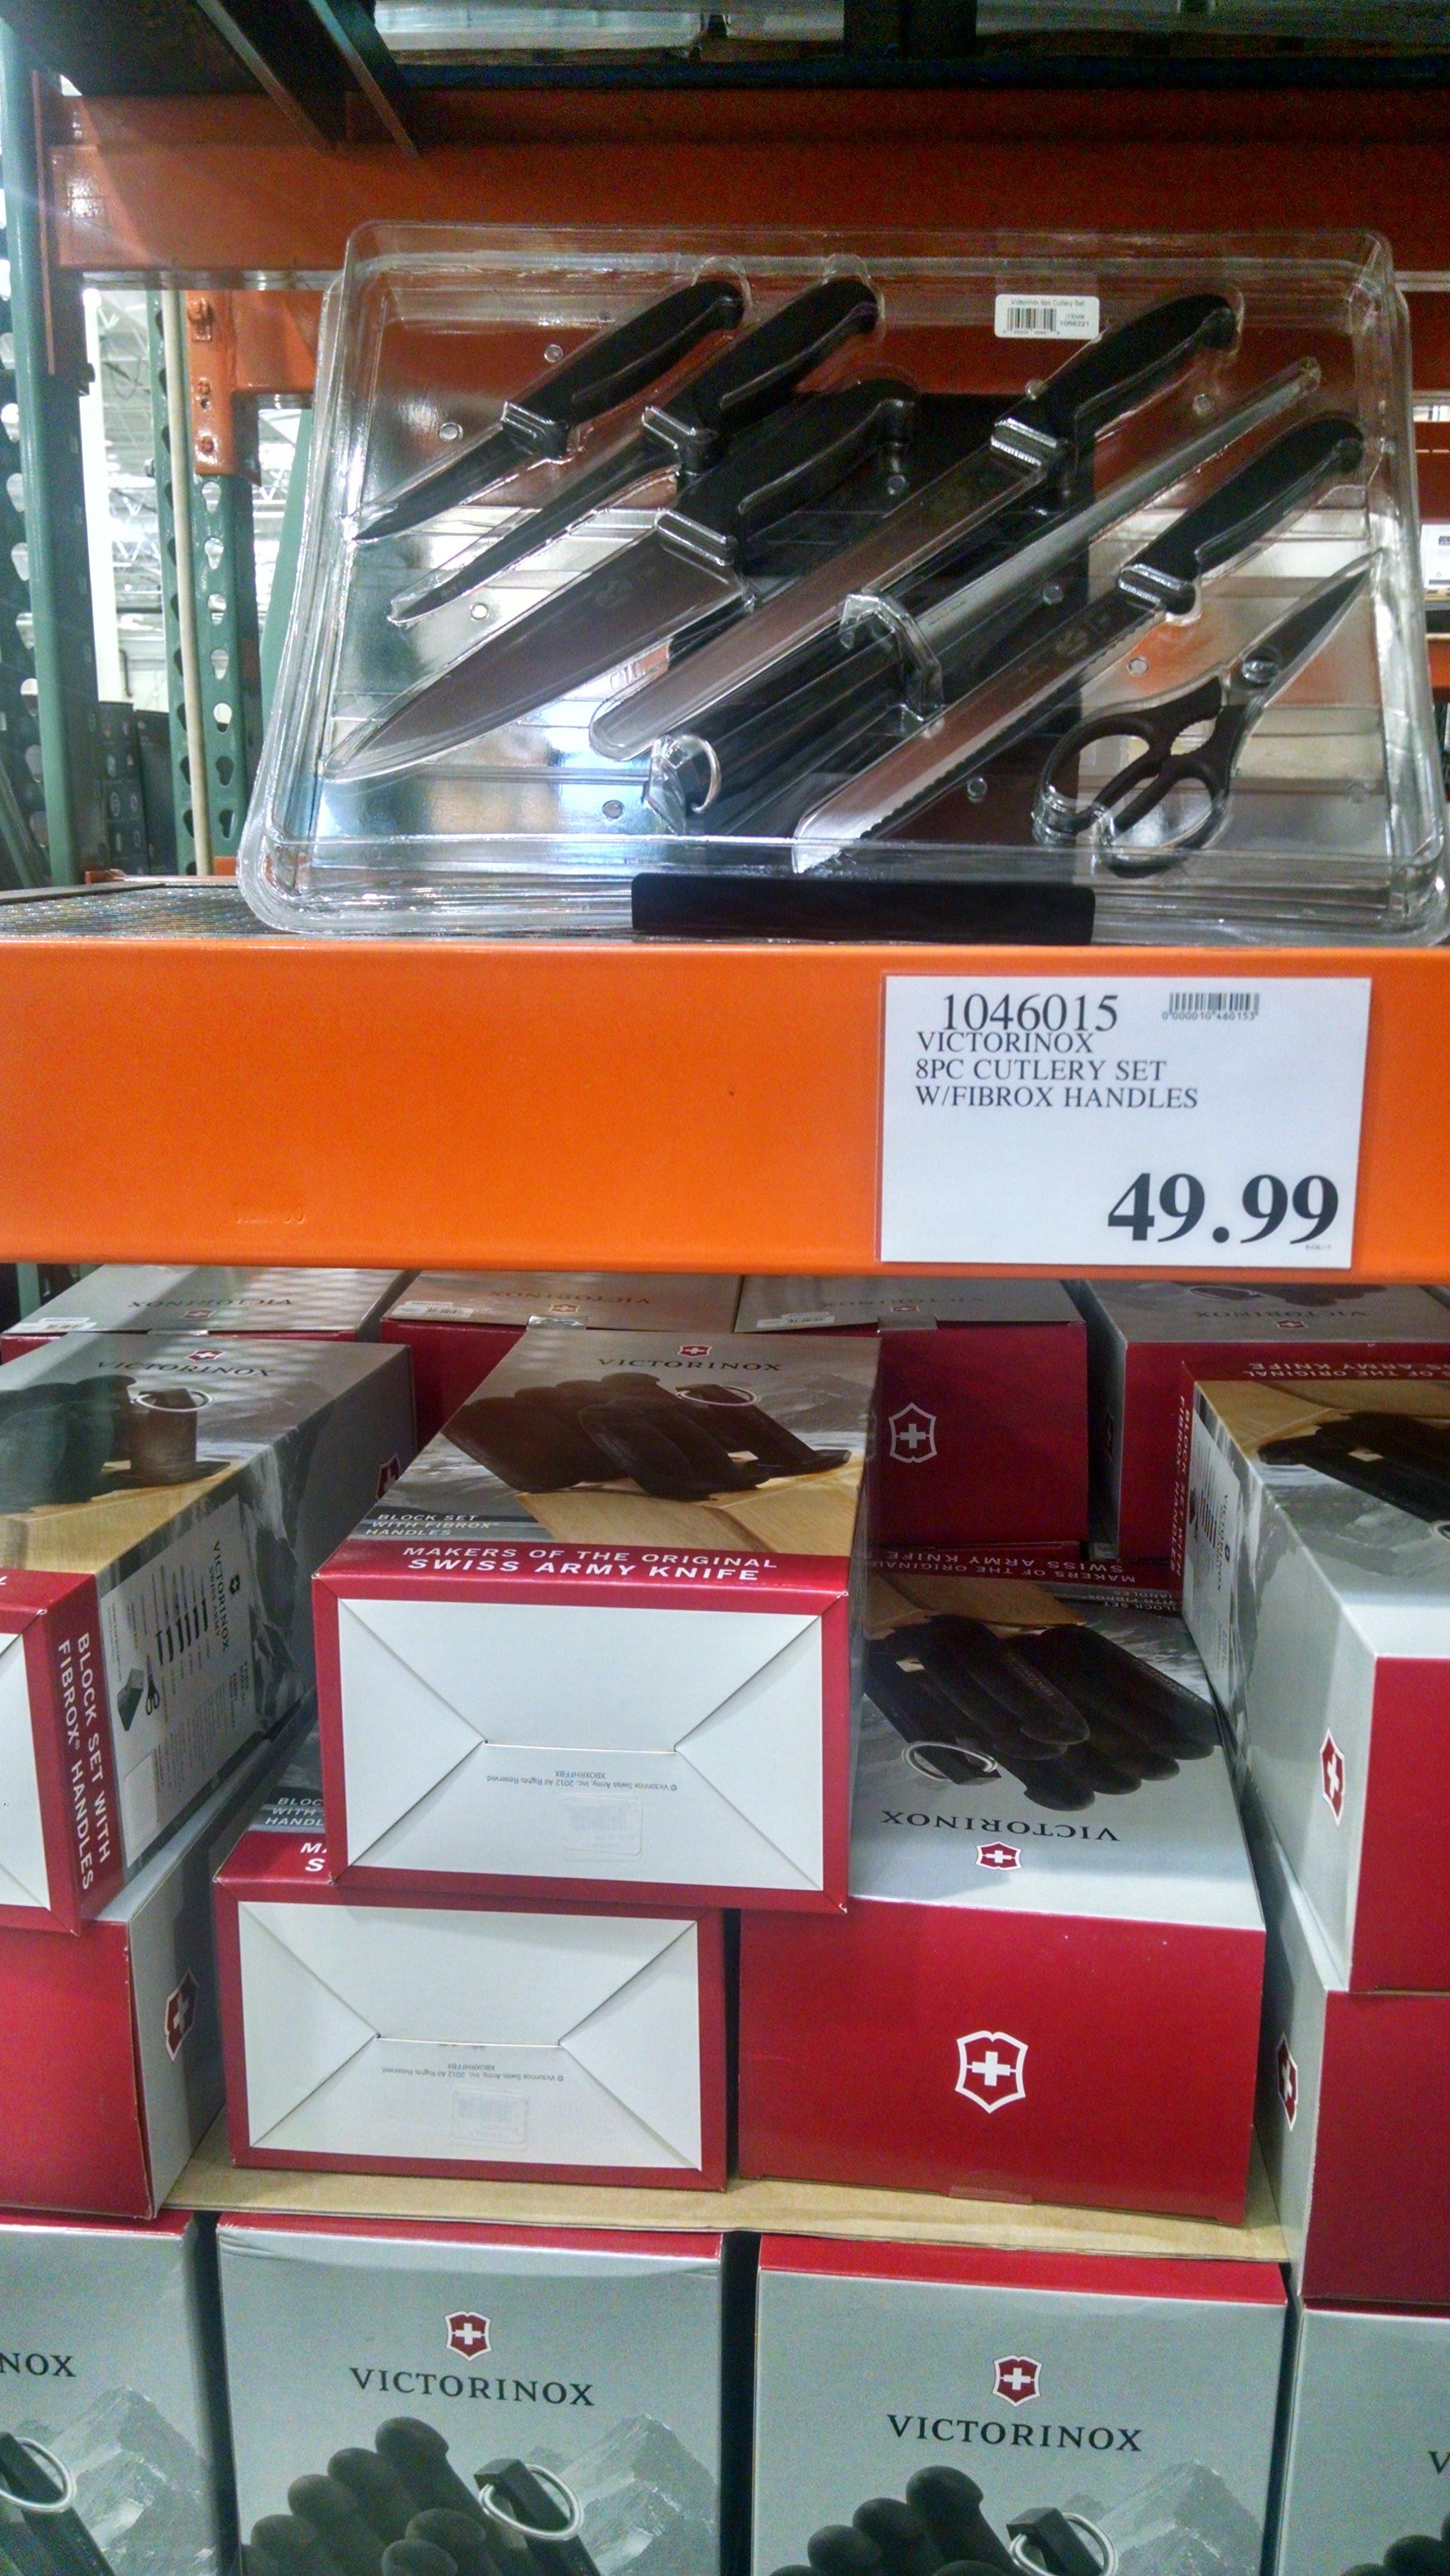 Victorinox 8-piece Knife Set, Costco, in-store, YMMV $50